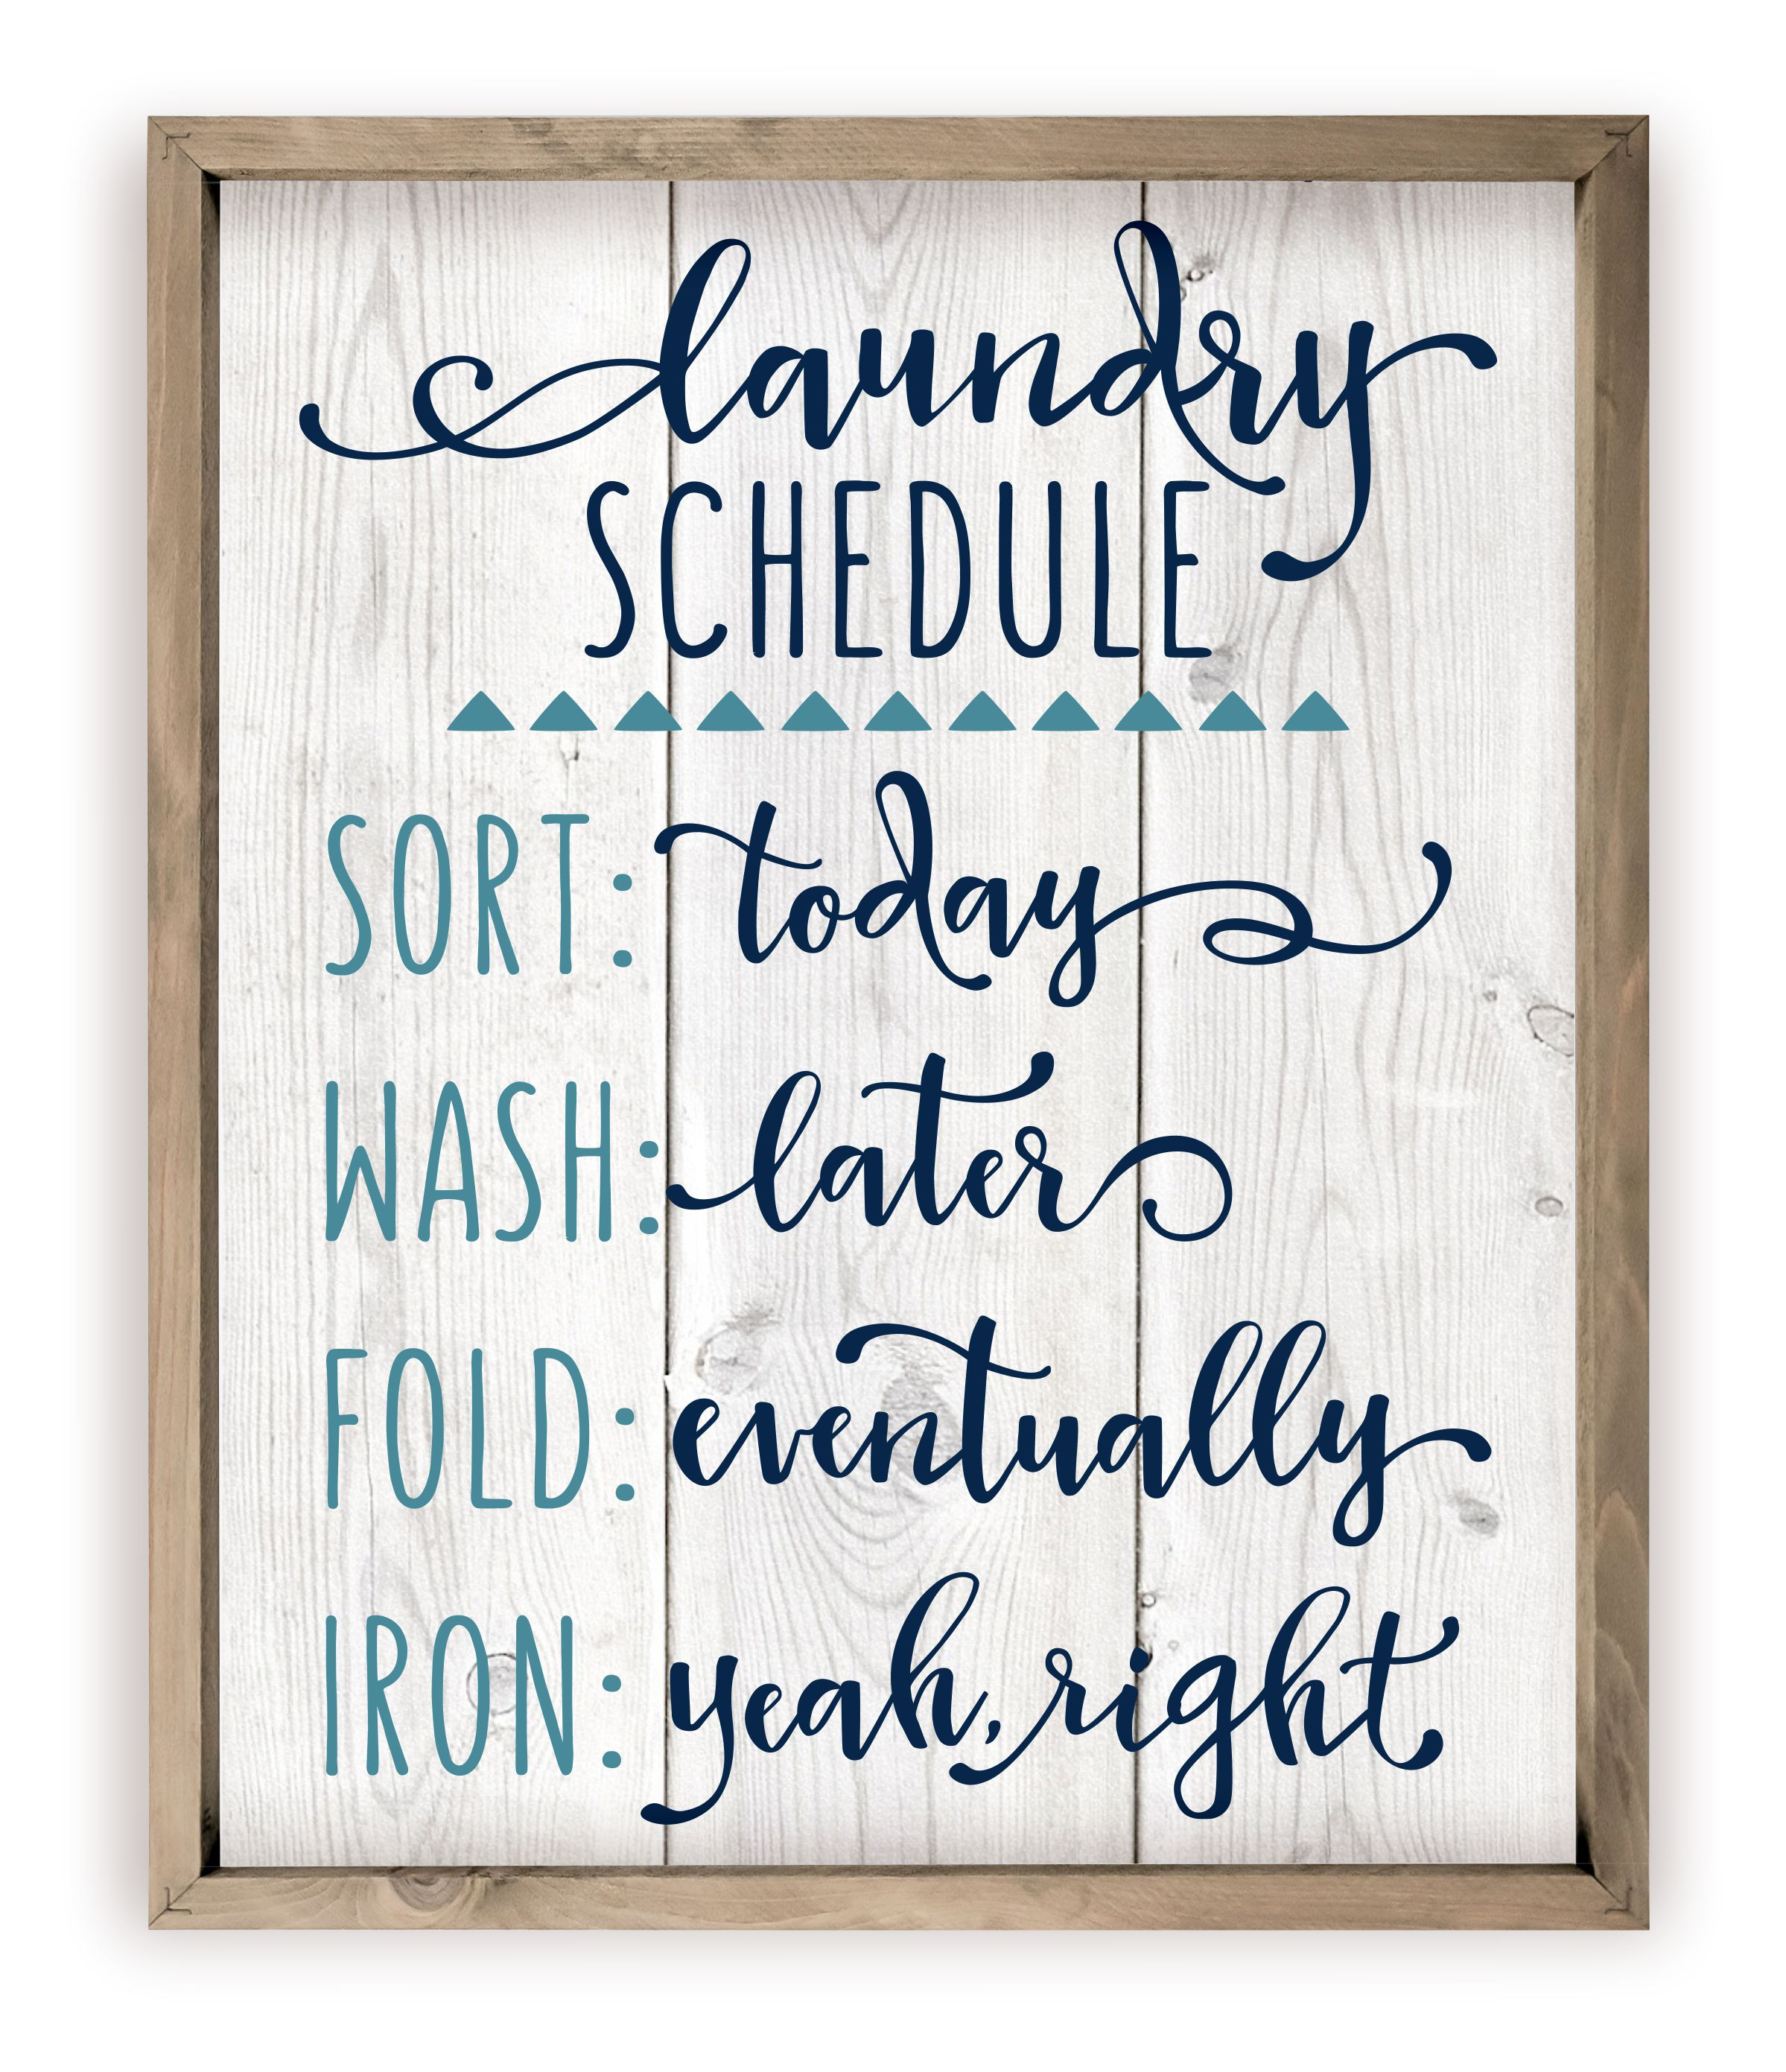 tp1215-03-fr-laundry-schedule.jpg